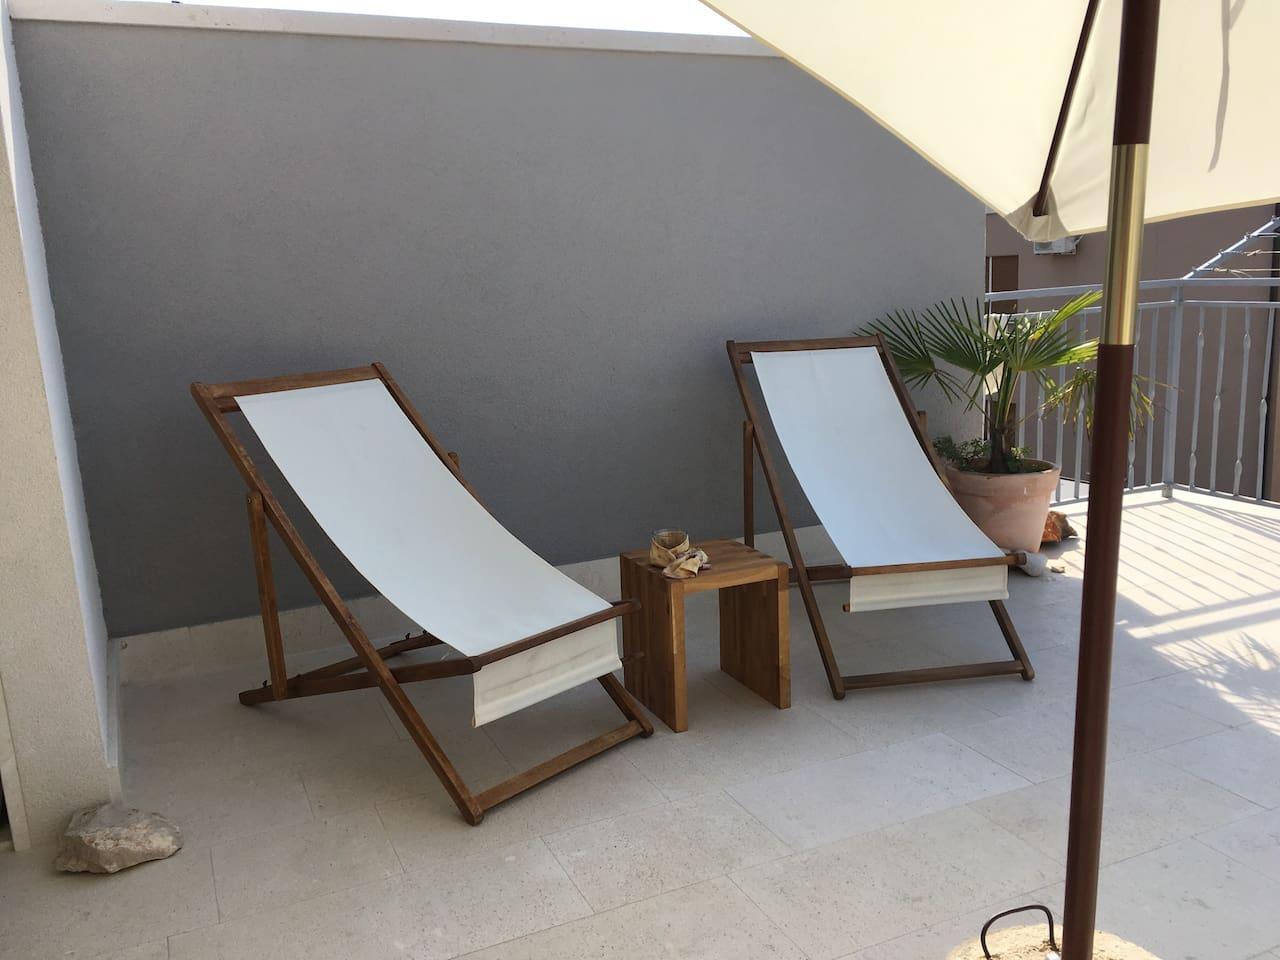 sommerchill unter sternen - apartments for rent in kaštel stari, Badezimmer ideen